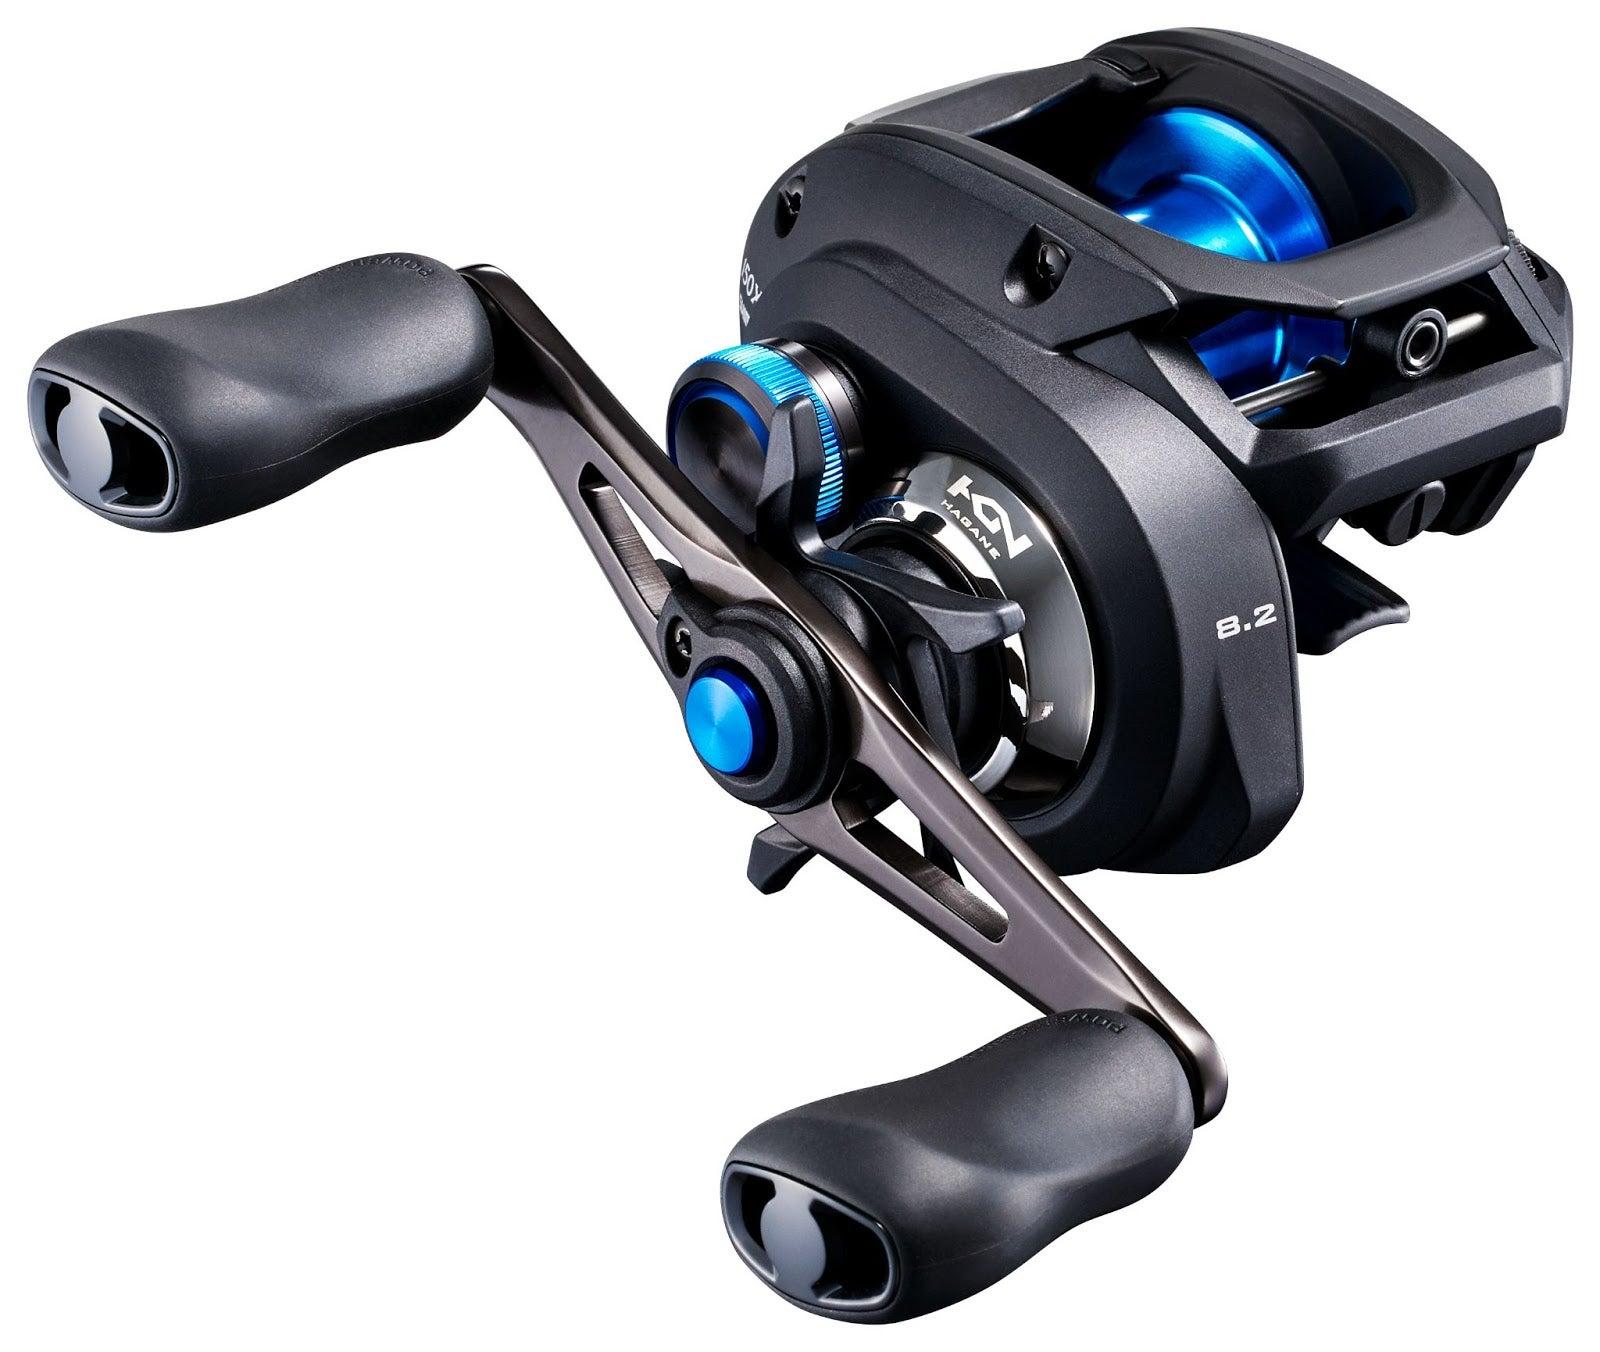 Shimano SLX DC fishing reel